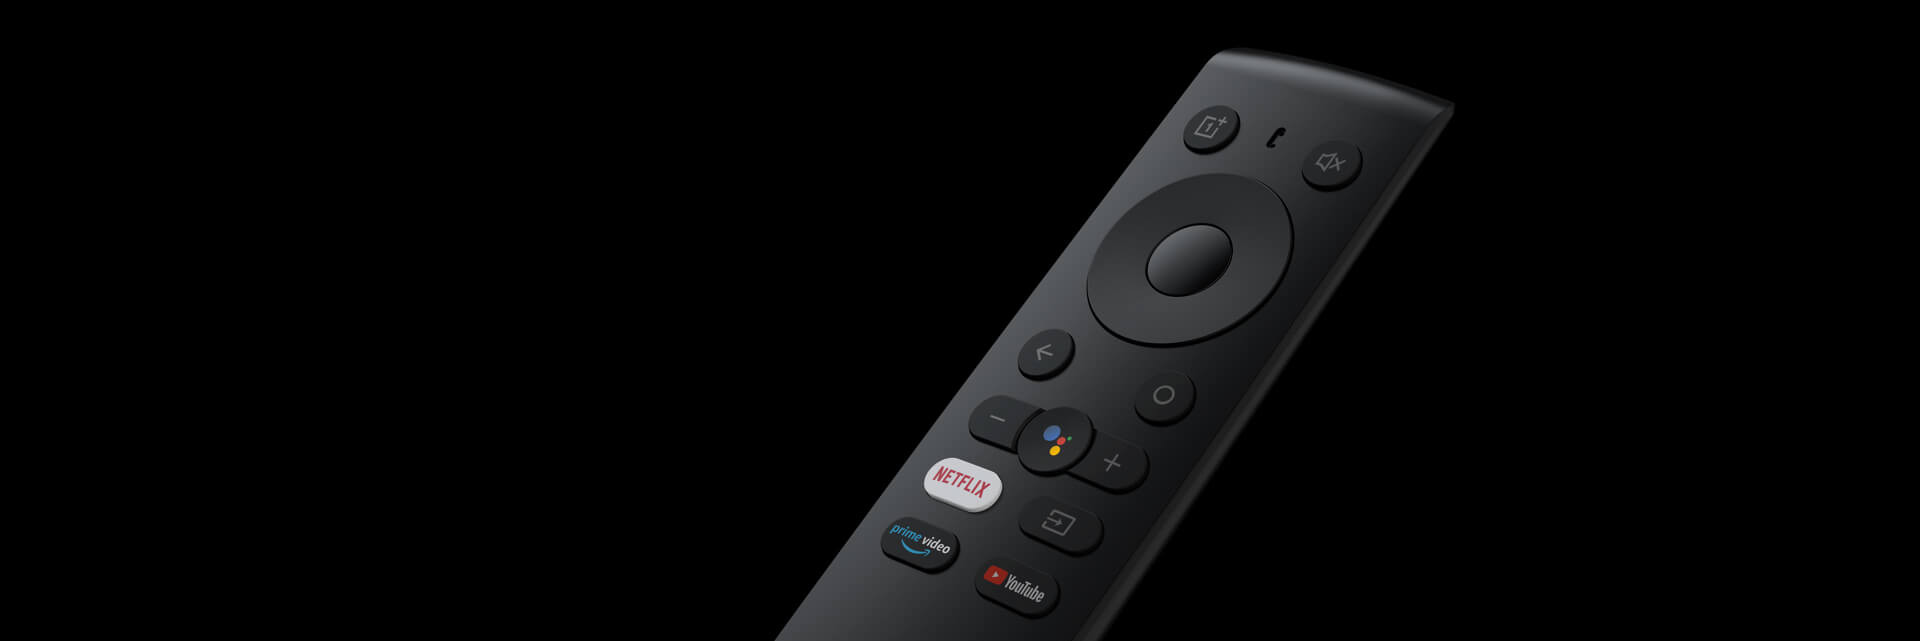 OnePlus TV med Netflix Remote